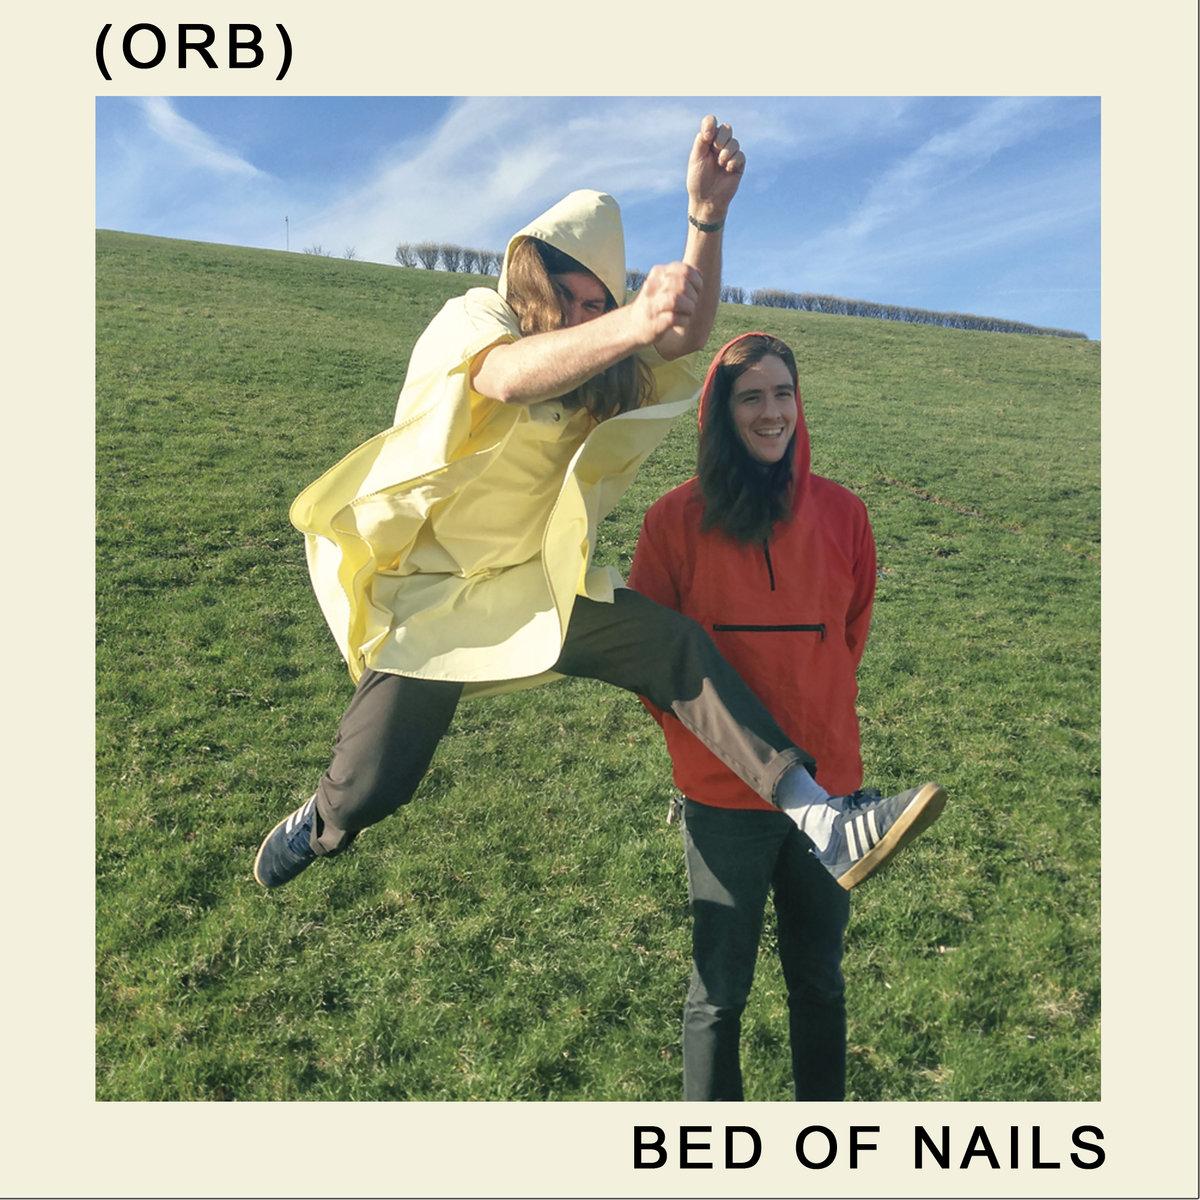 GLS029 - (ORB) - Bed of Nails